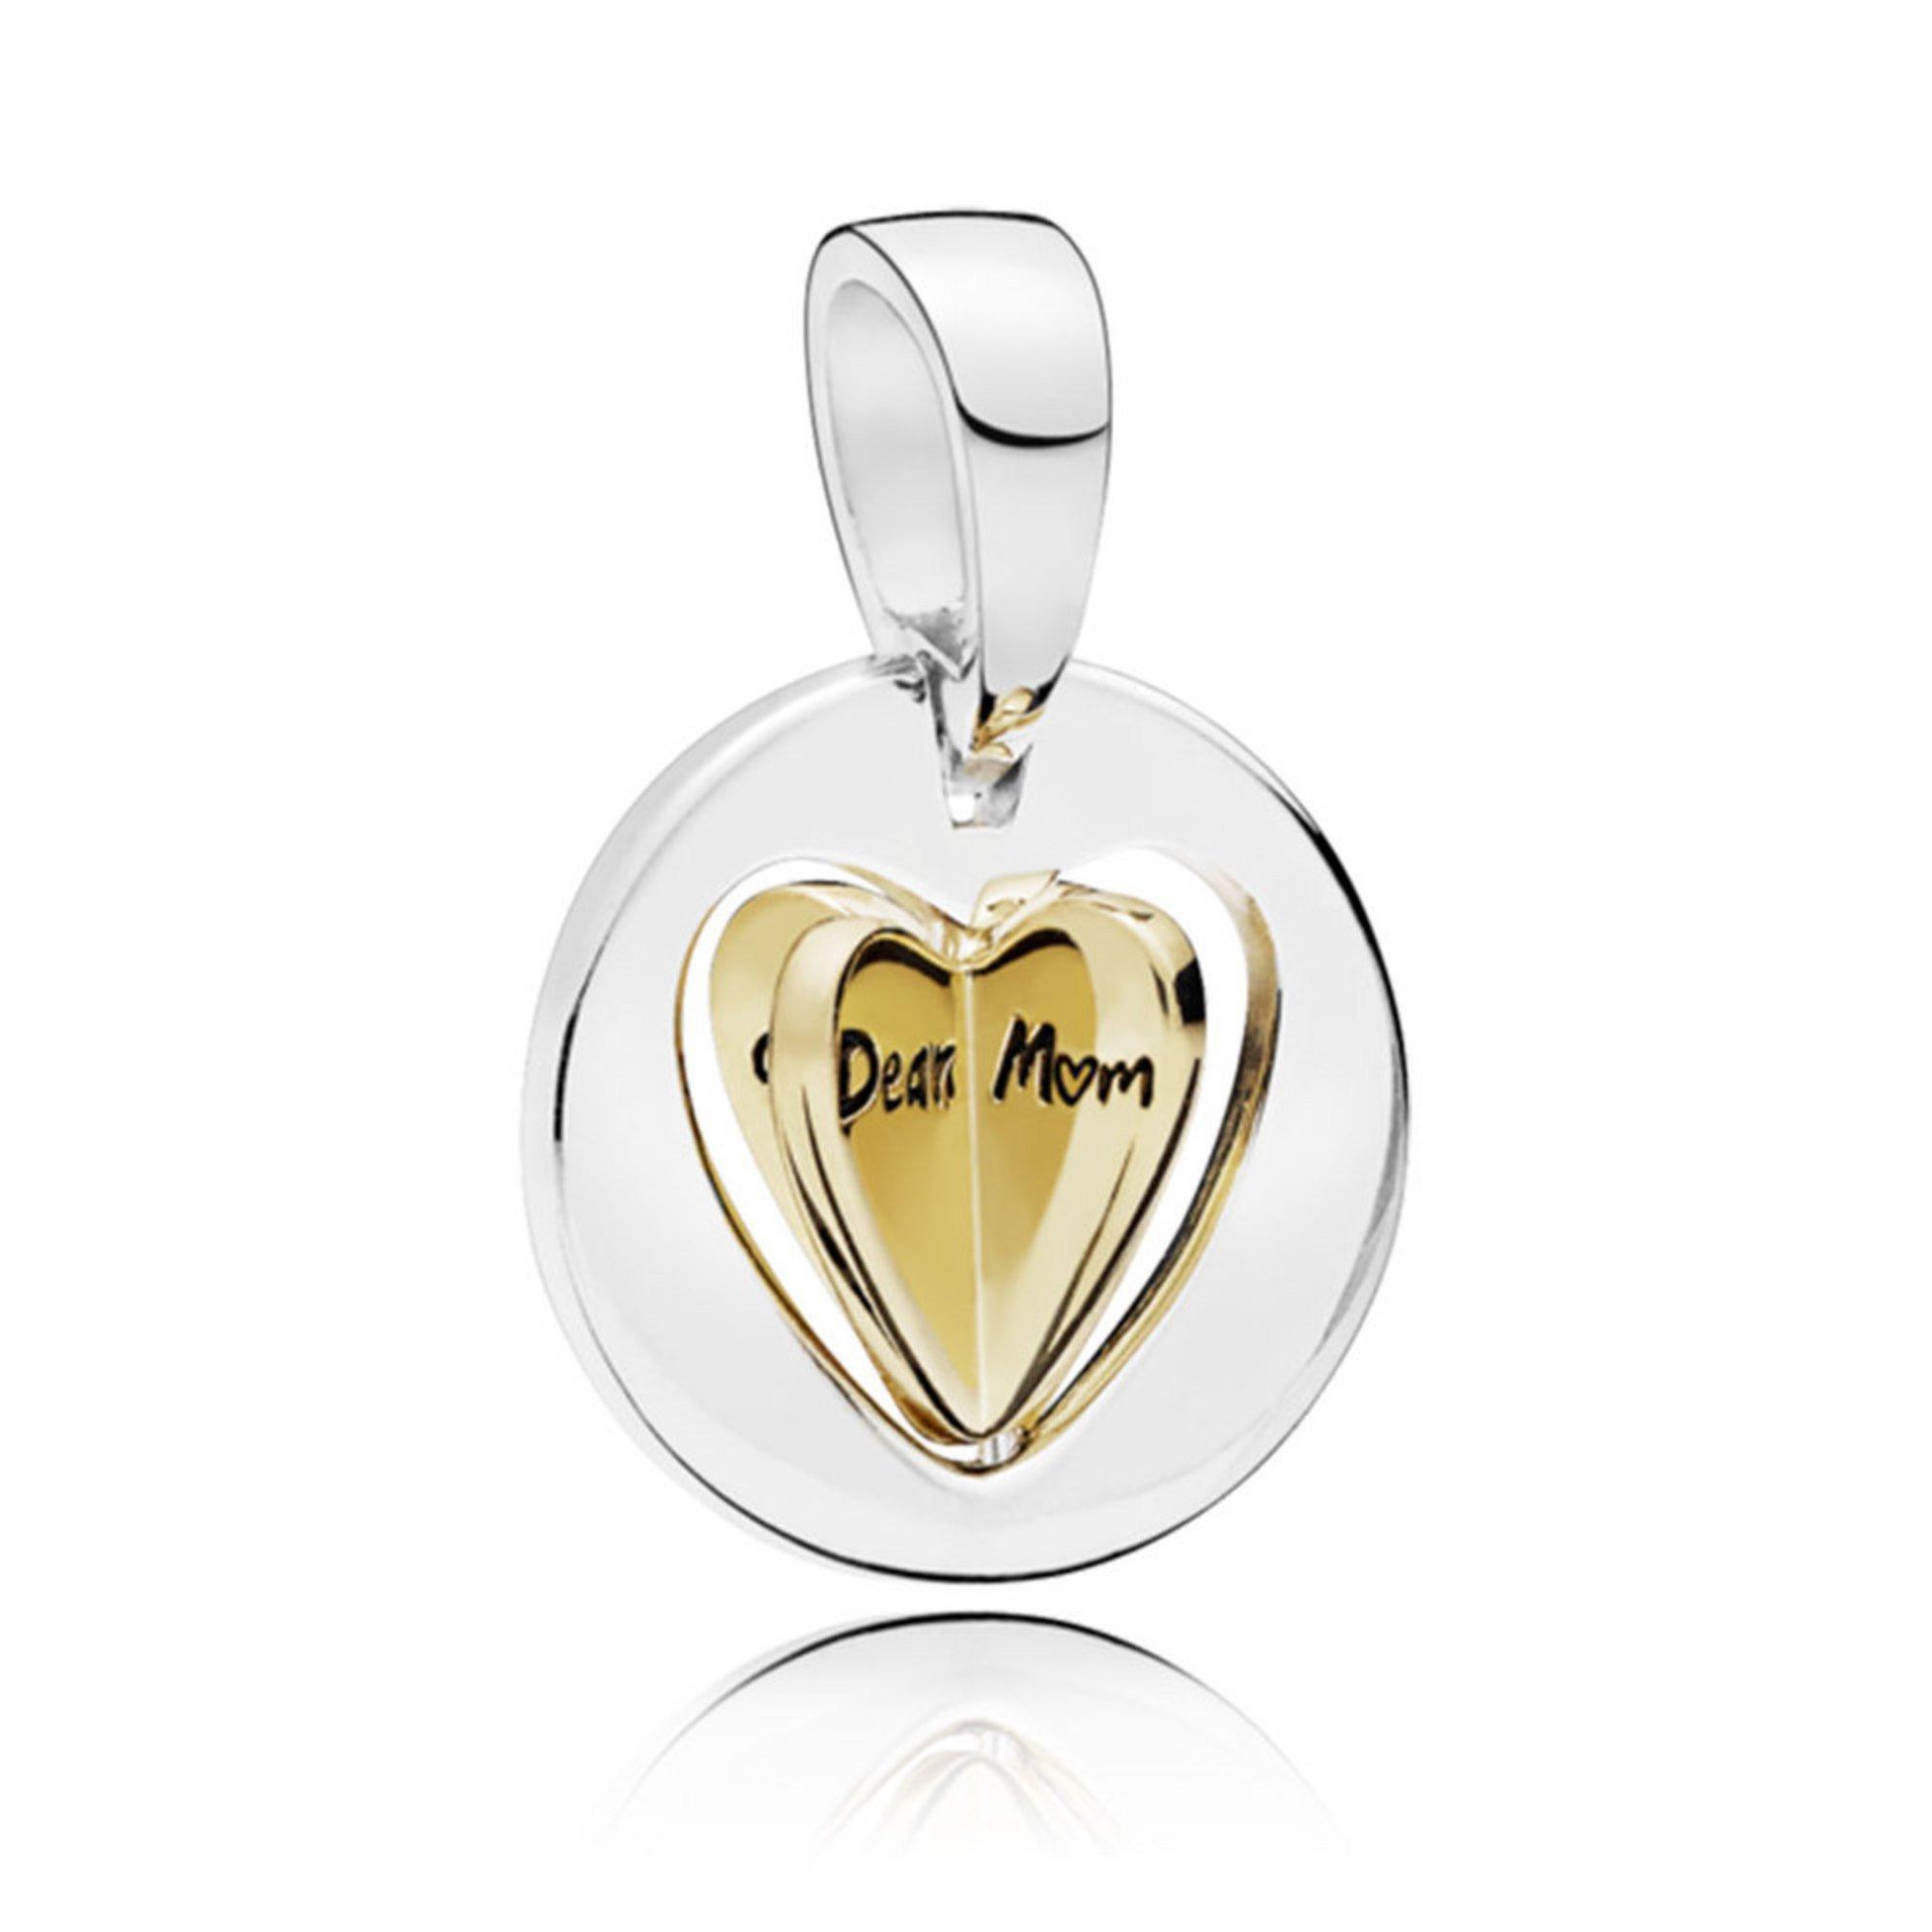 6e407d5a0 Pandora Mum's Golden Heart Pendant Charm | Charms - Shop Your Navy ...